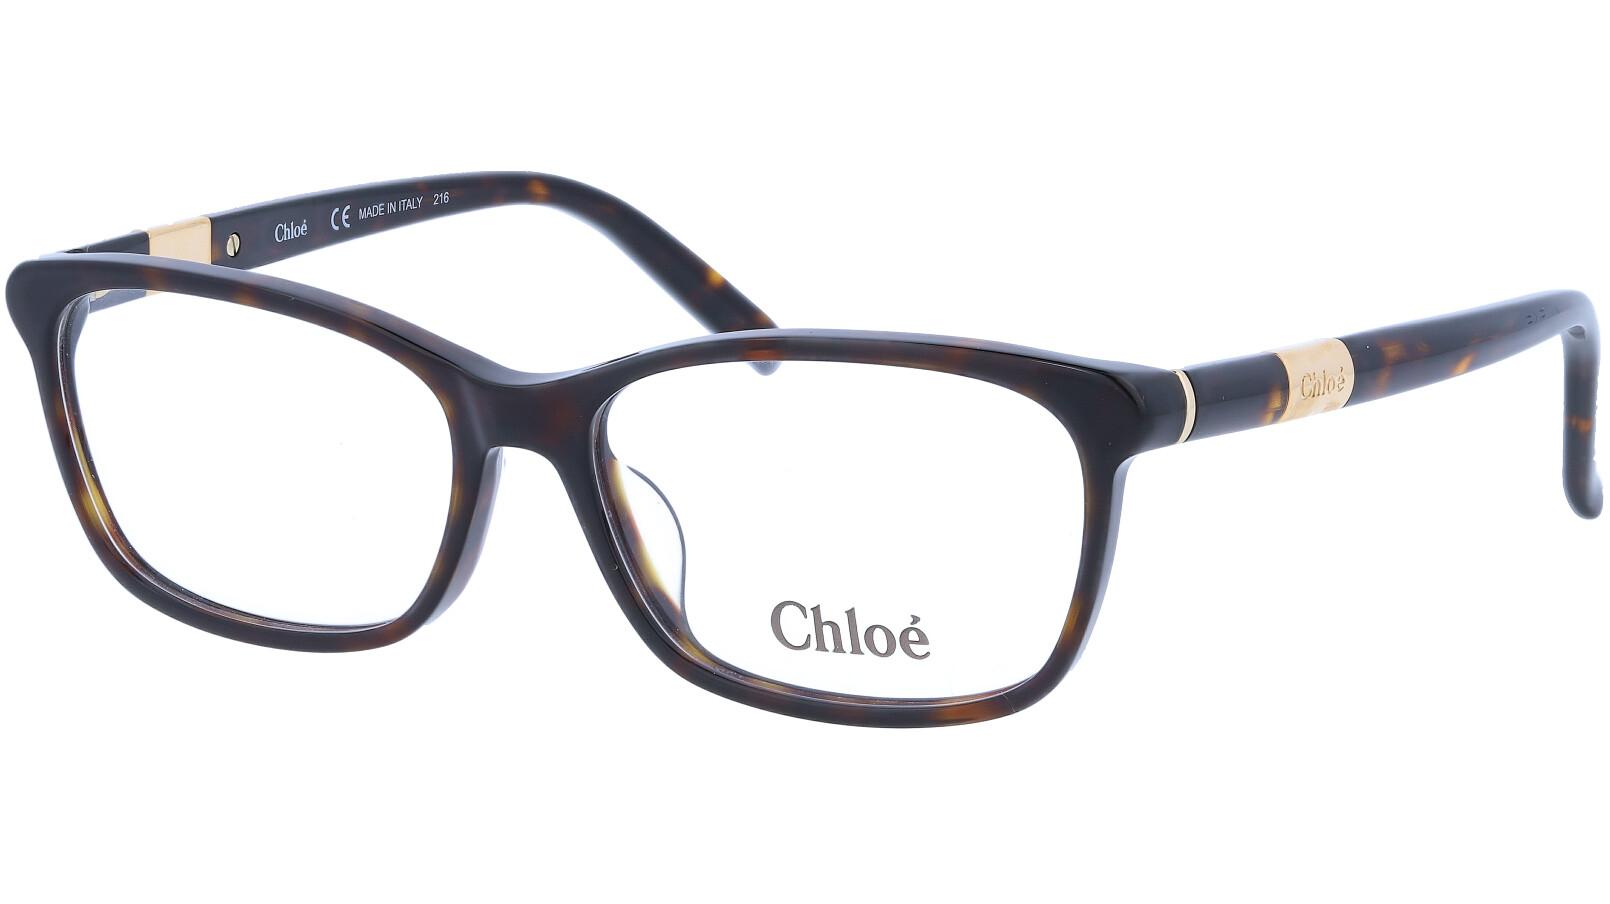 CHLOE CE2628 219 53 TORTOISE Glasses